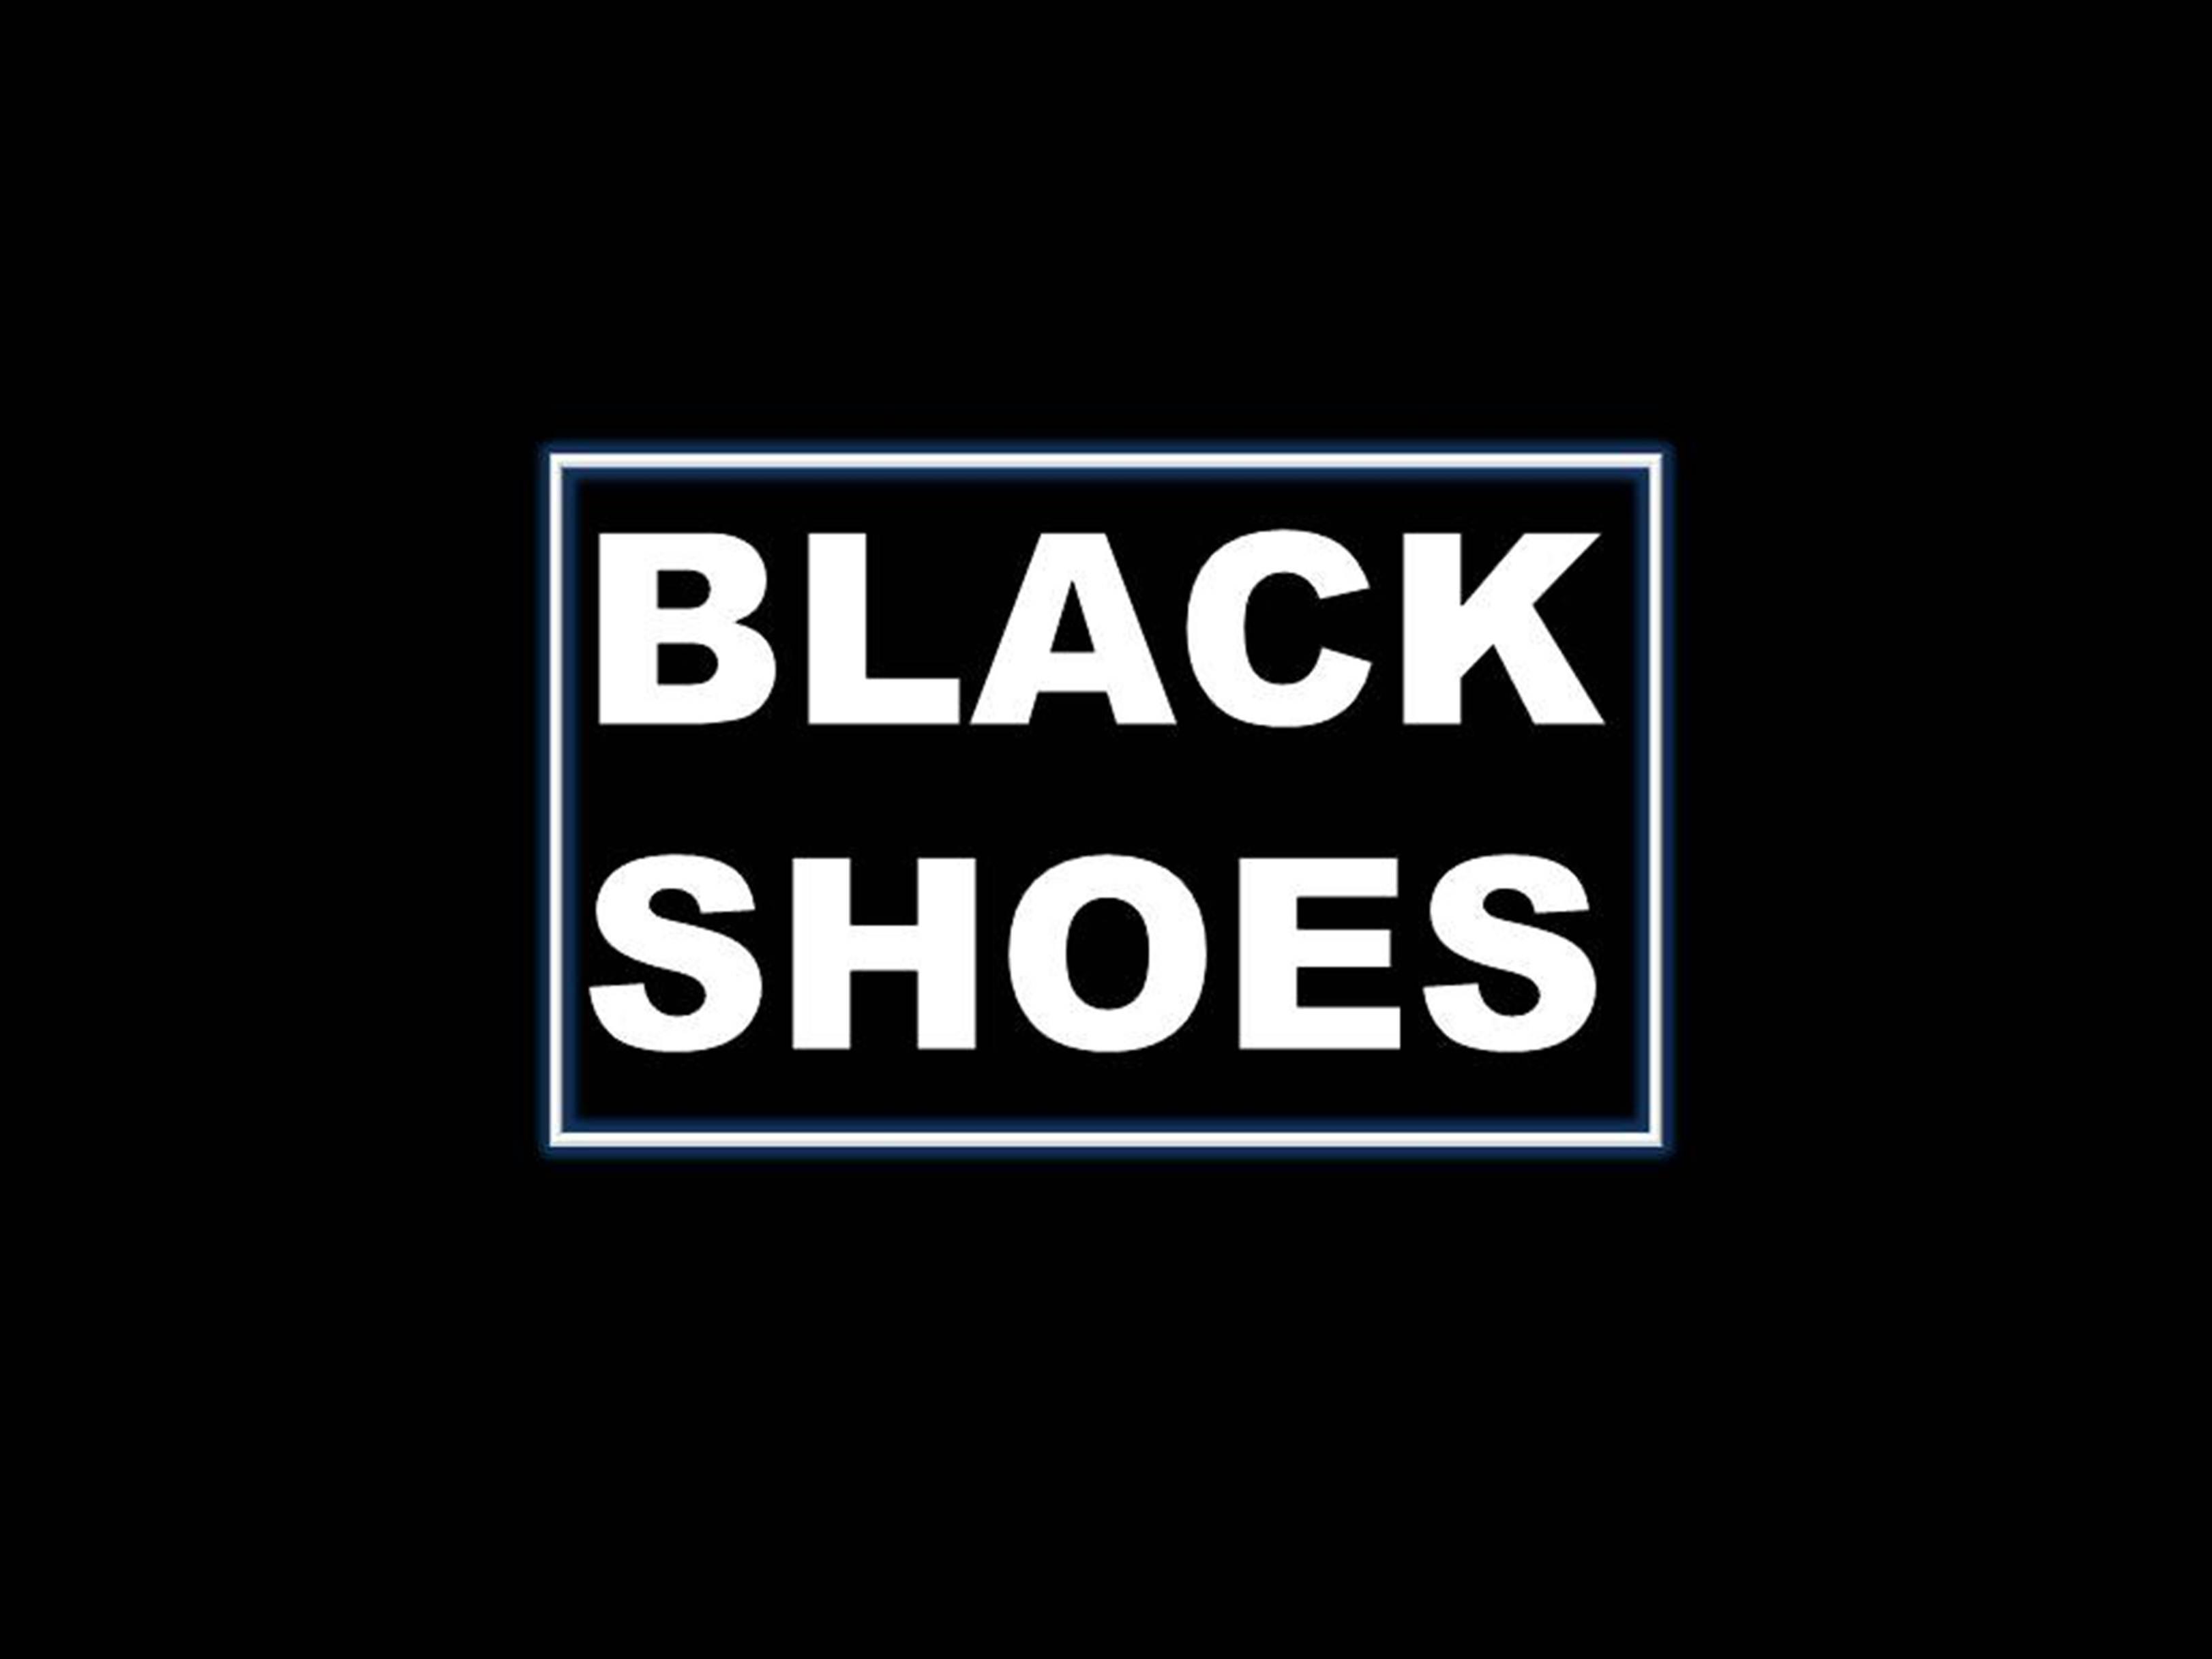 Jual Black Shoes Loafers Slip On Sepatu Pantofel Semi Formal Pria Cepc Kulit Cocoes Hitam A9h